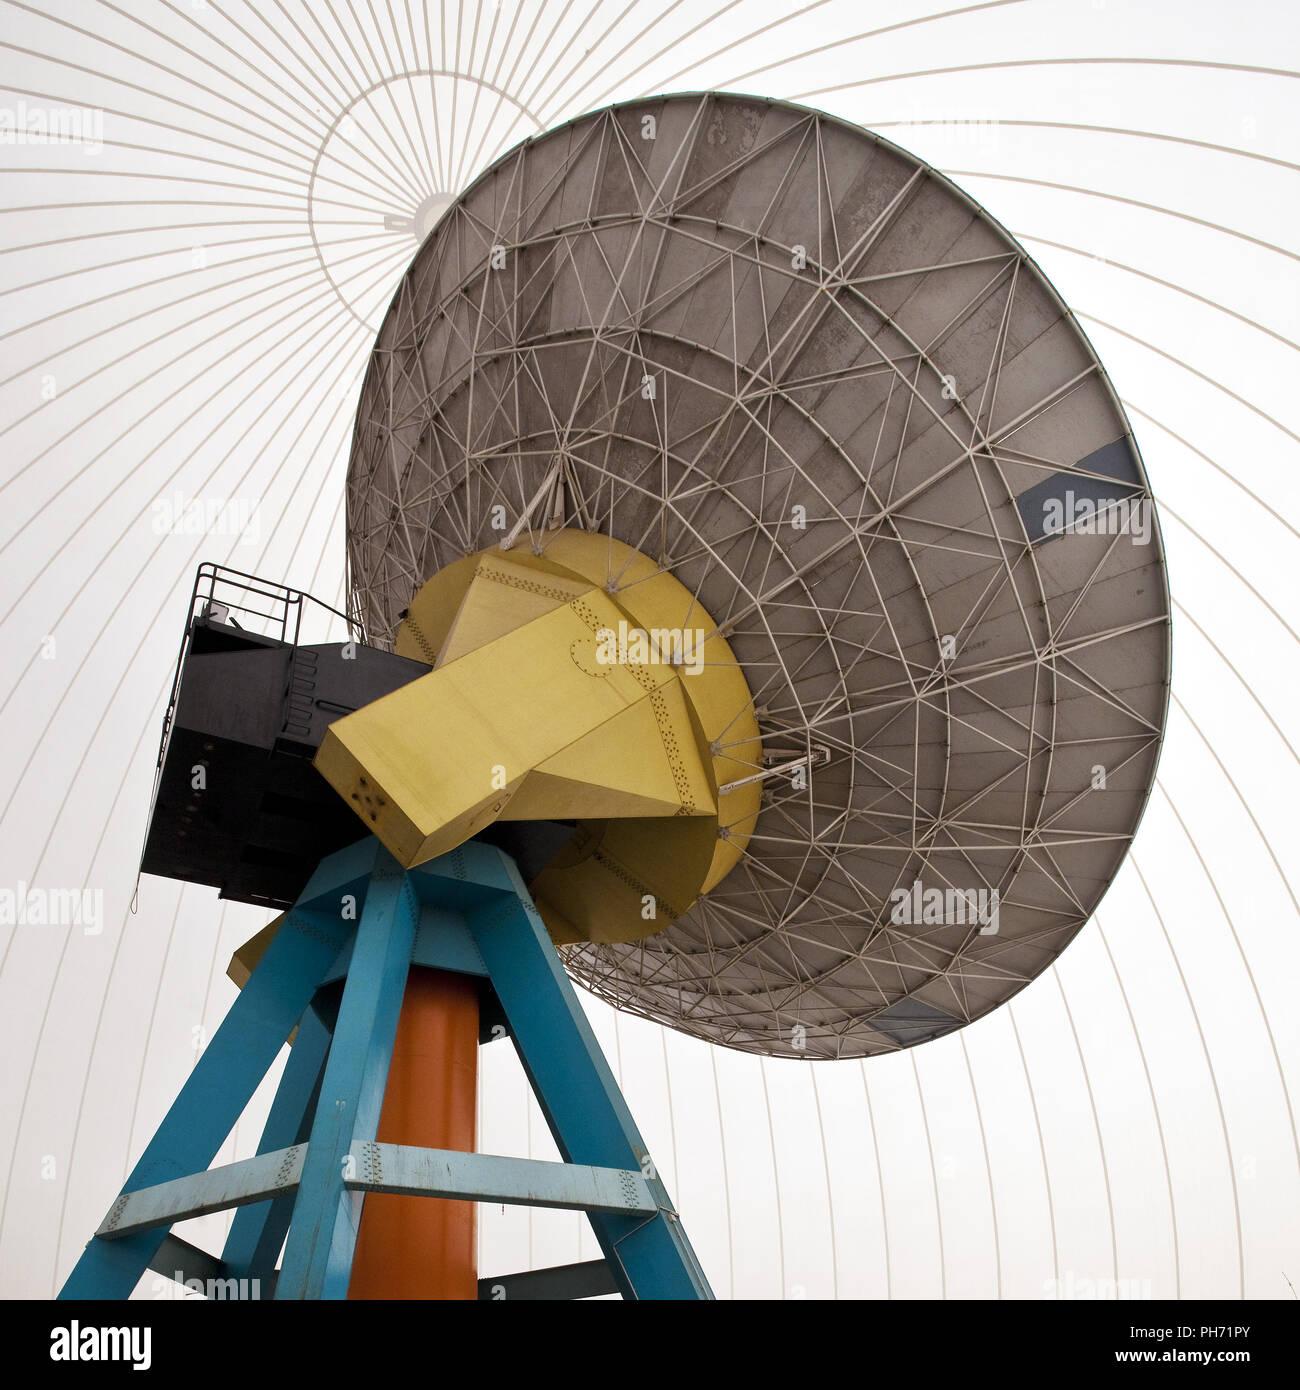 Parabolic antenna, observatory in Bochum, Germany. - Stock Image